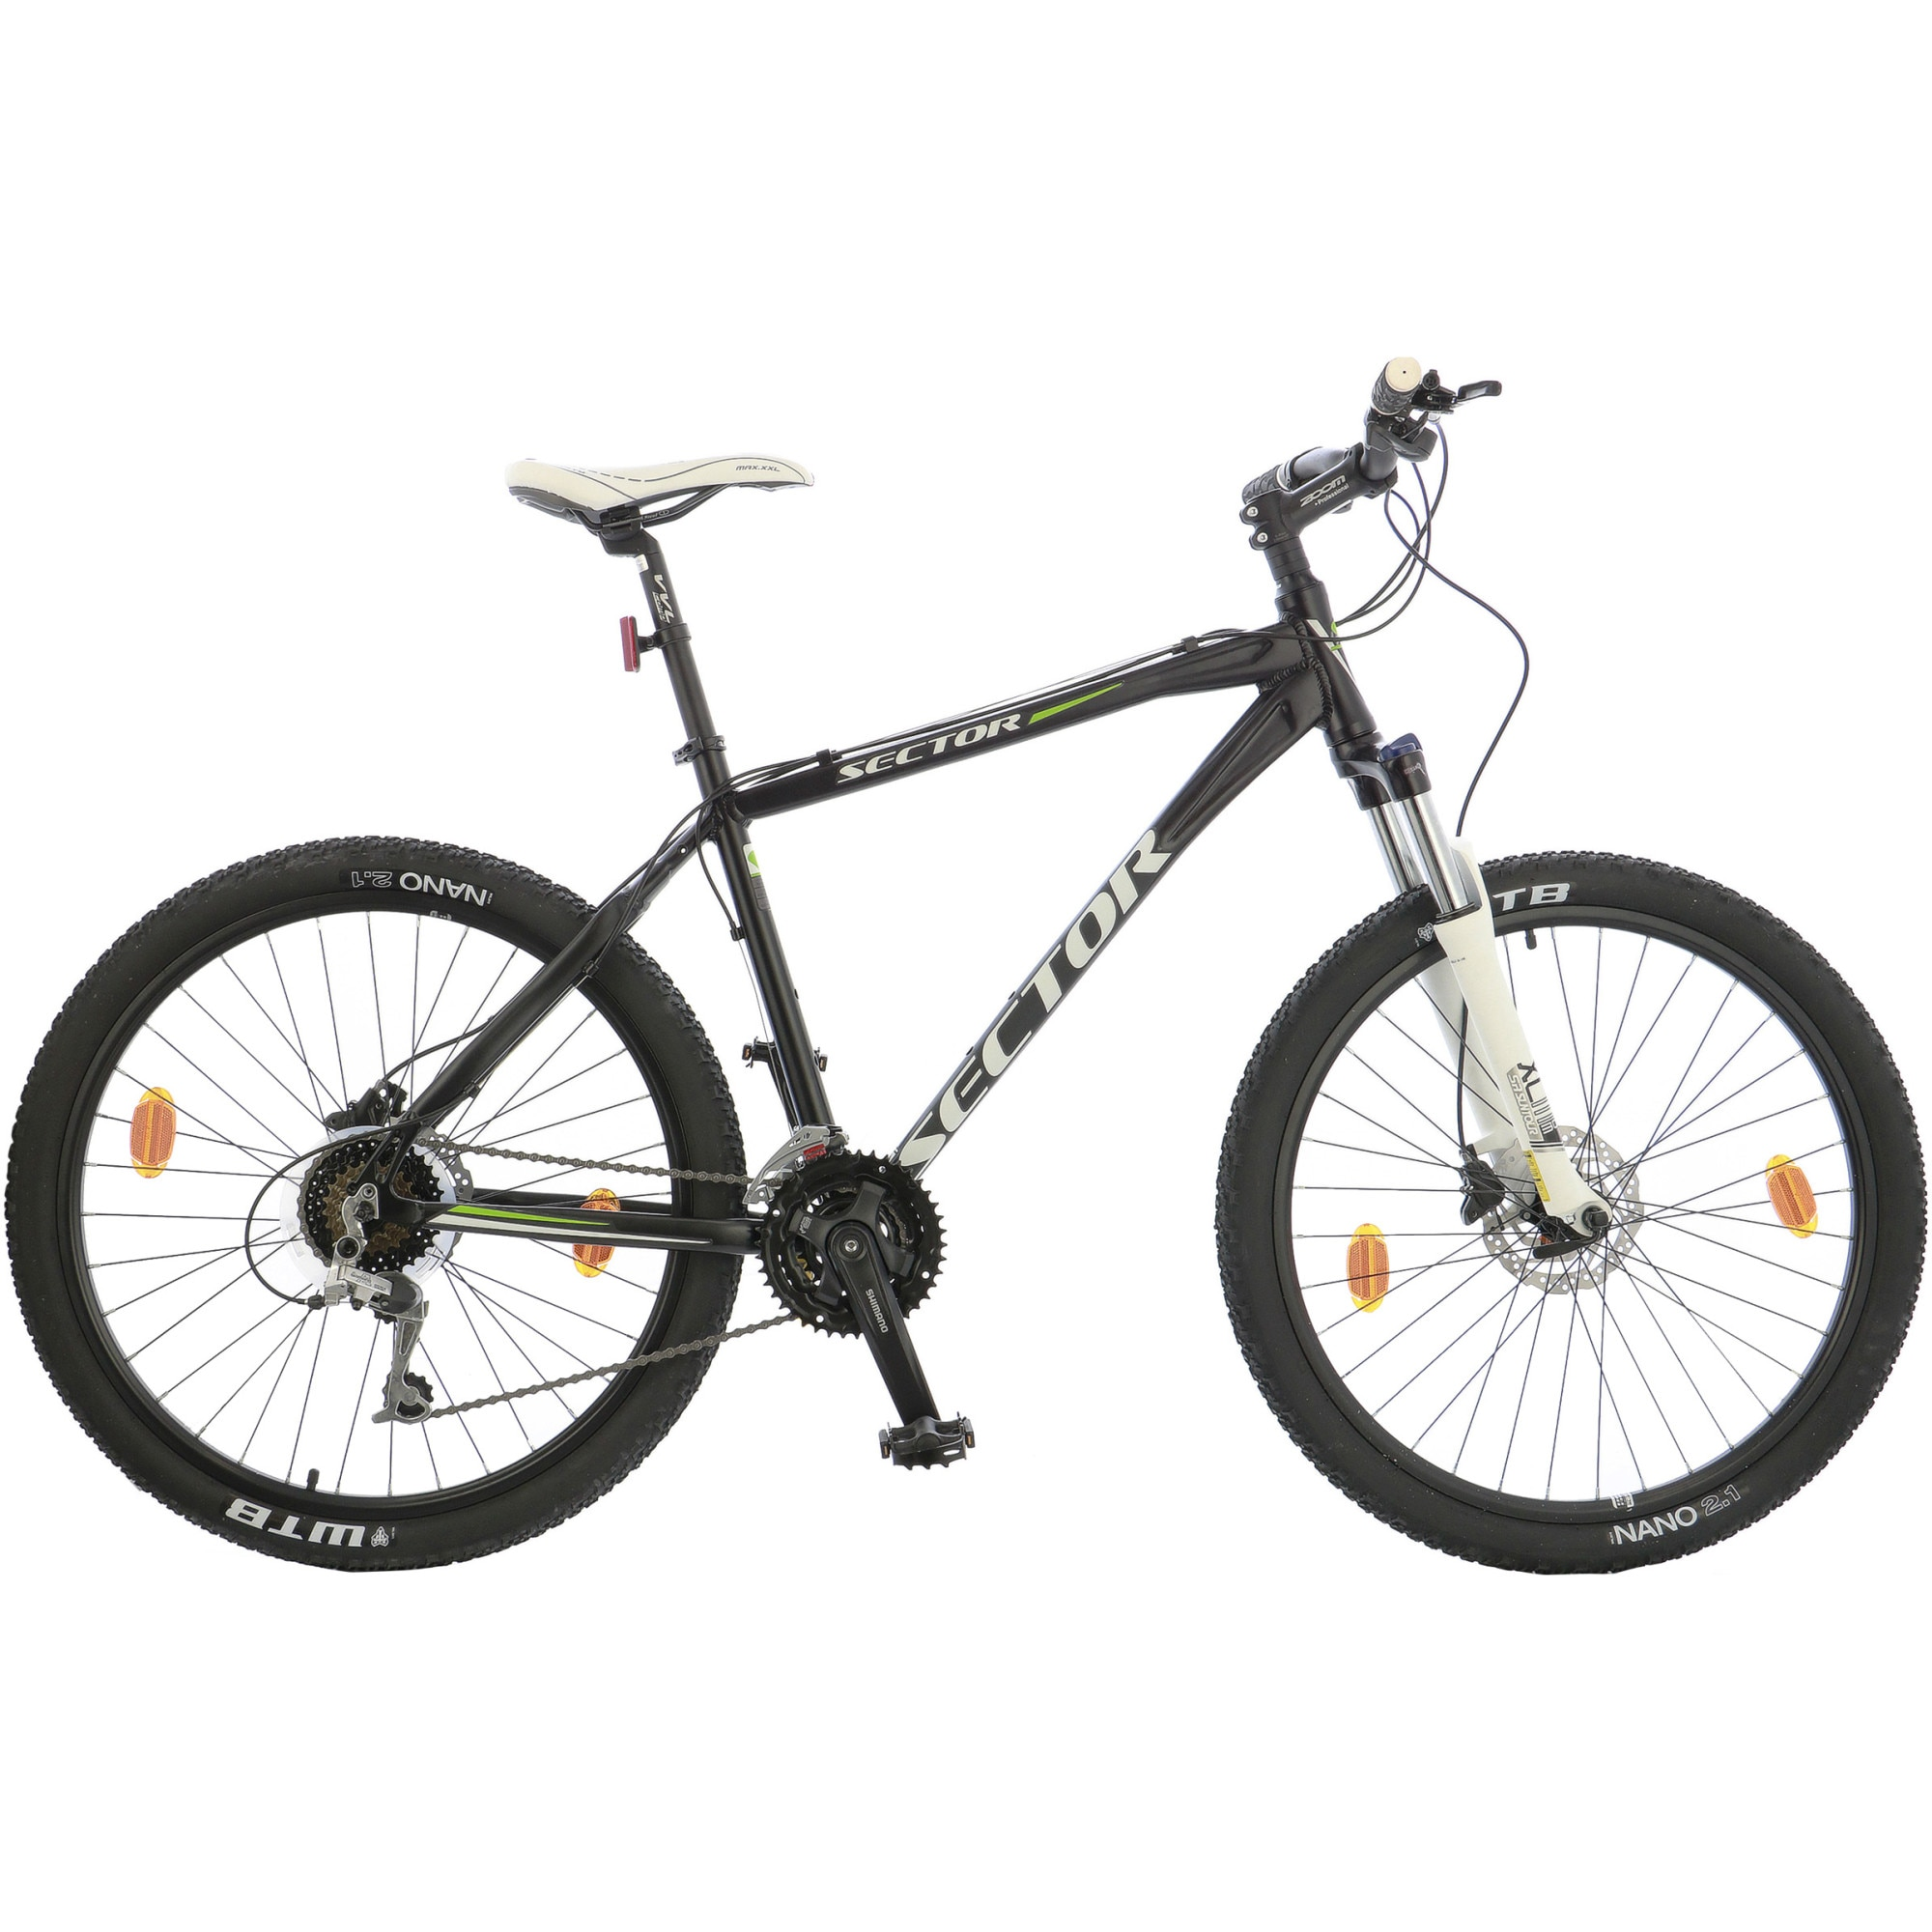 "Fotografie Bicicleta MTB 26"" Leader Sector Shimano Acera, frane hidraulice, furca Suntour, cadru AL, 47cm, Black"